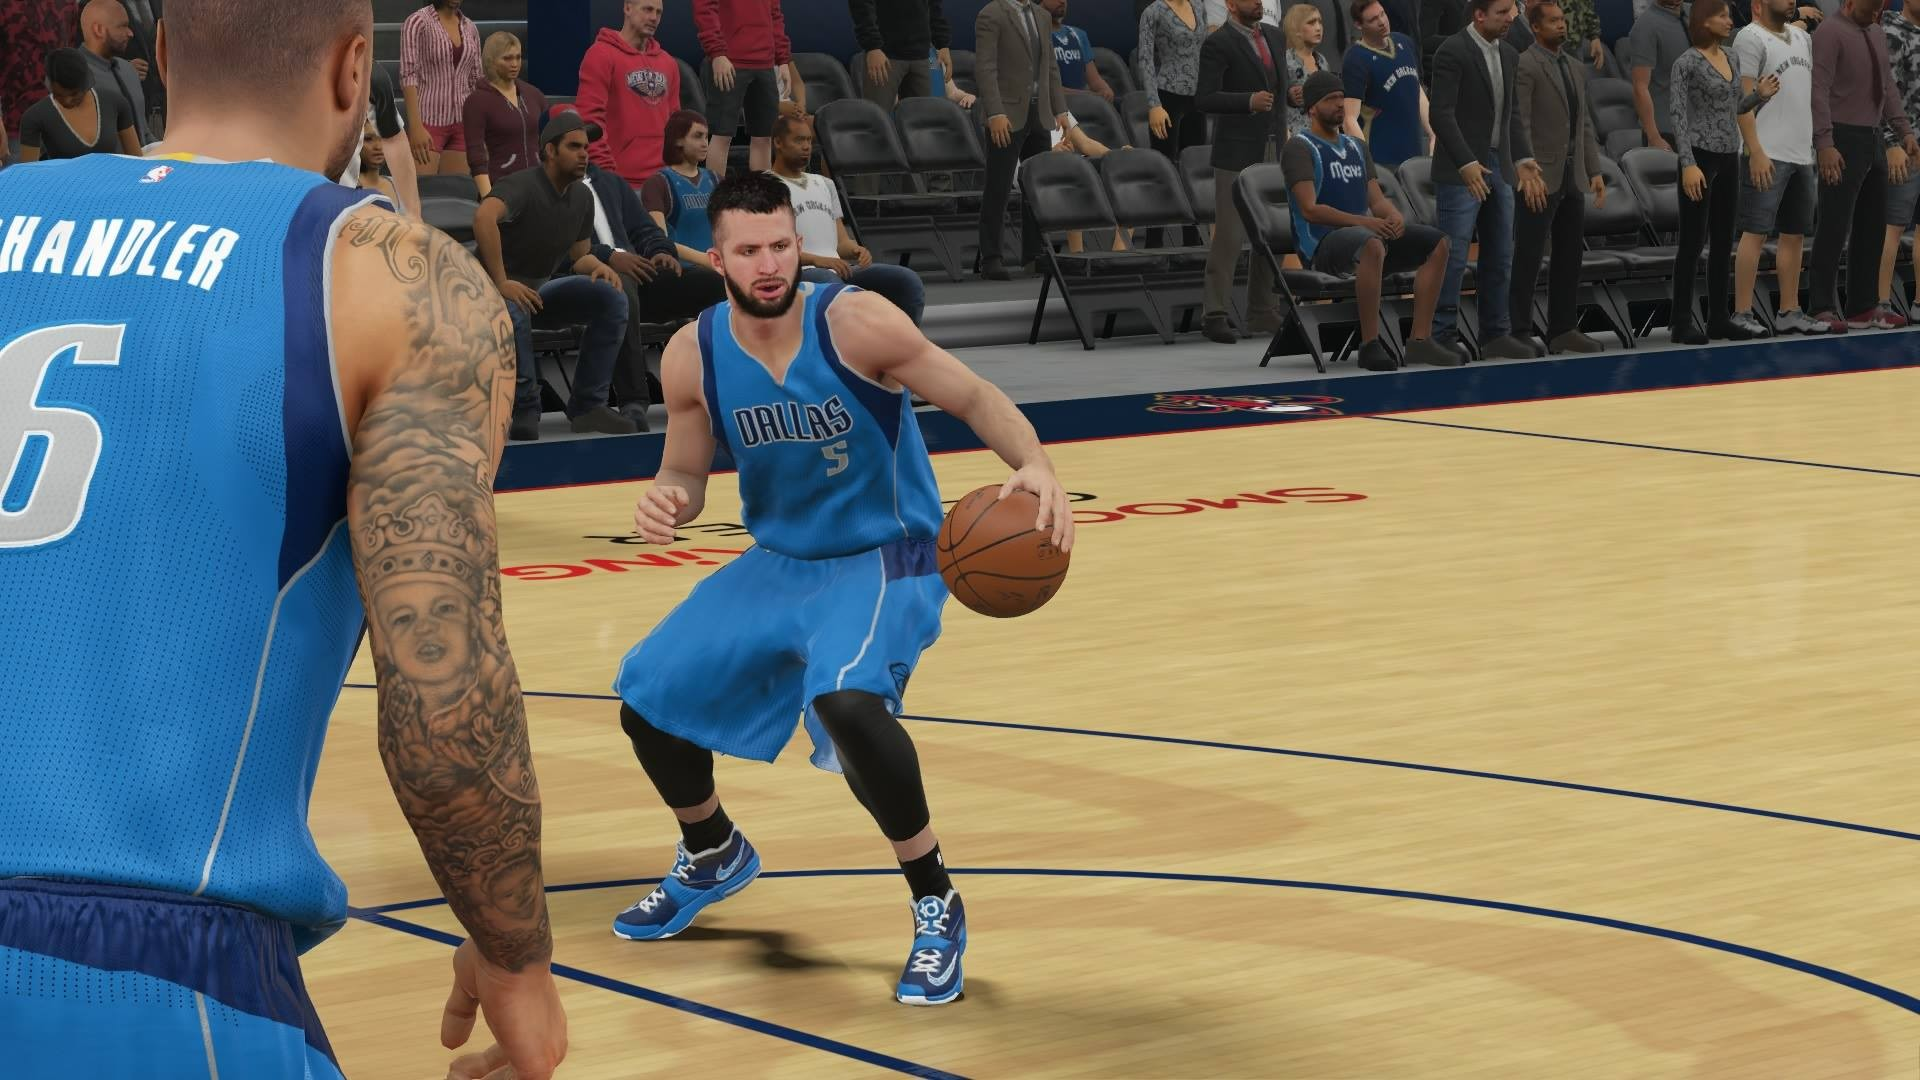 brand new 618a7 54c3b ... NBA 2K15 Roster Update Details (10-30-14) nba 2k15 kobe ...